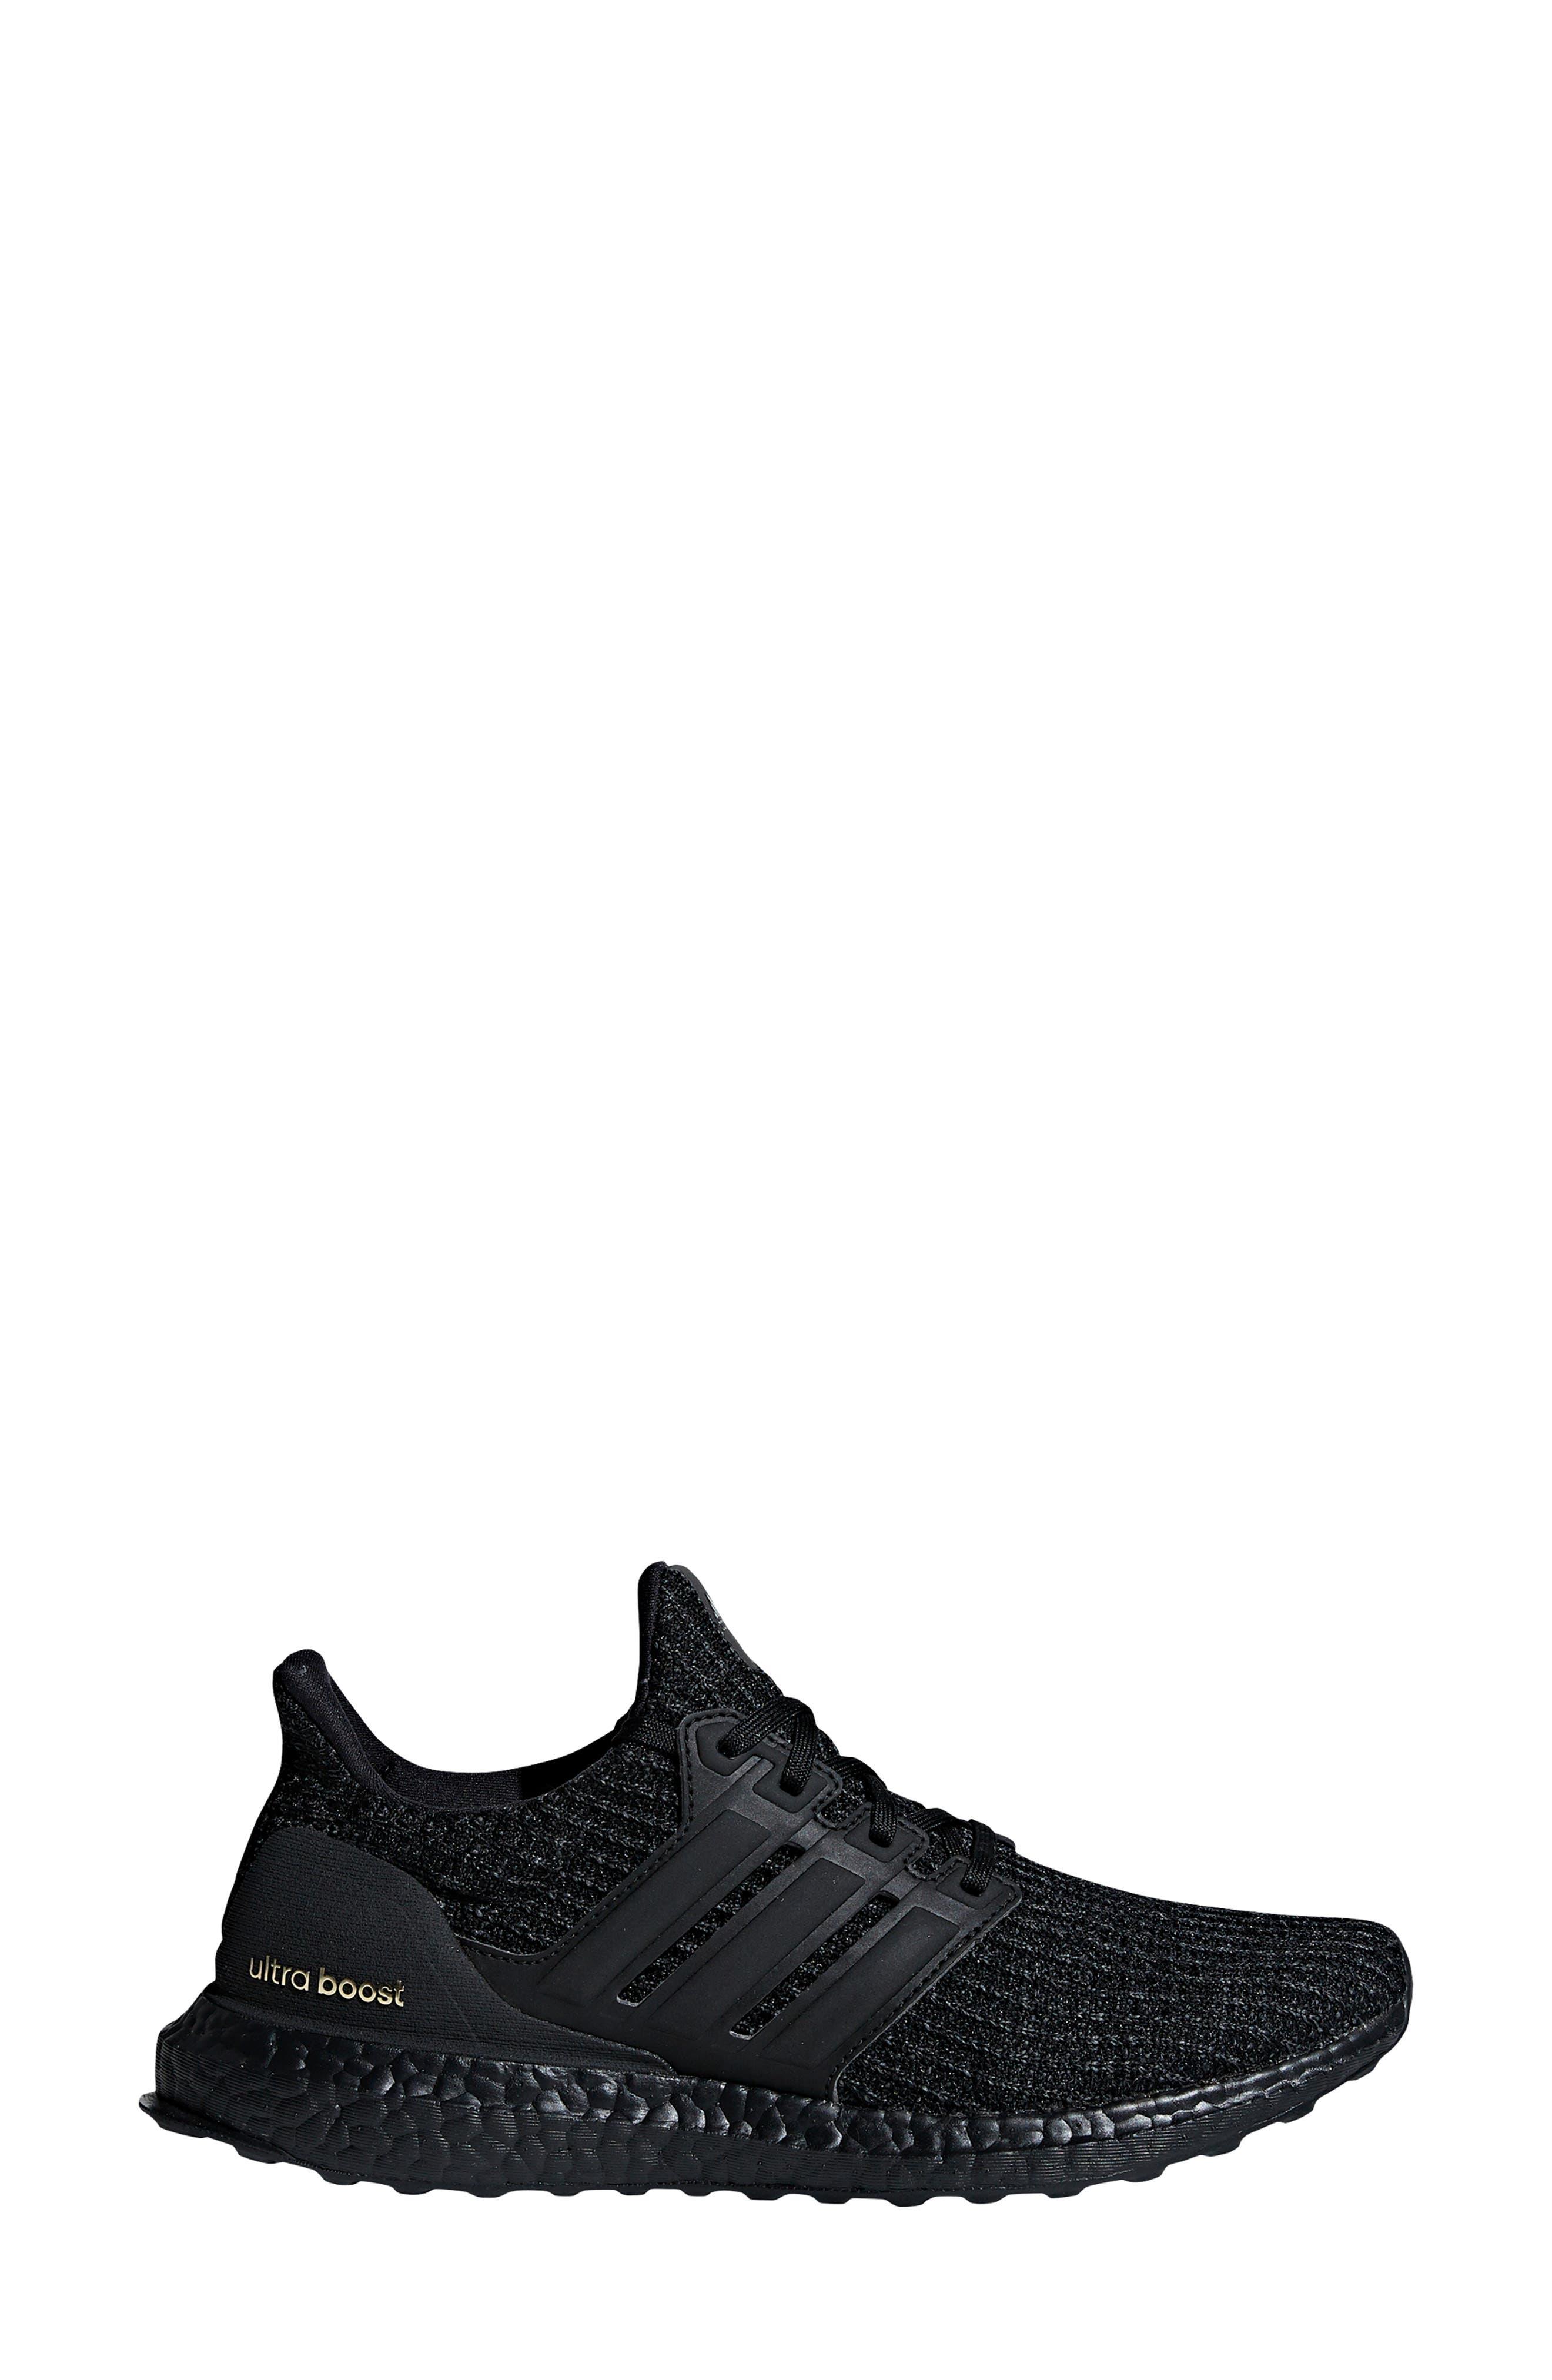 ADIDAS, 'UltraBoost' Running Shoe, Alternate thumbnail 9, color, CORE BLACK/ GOLD METALLIC